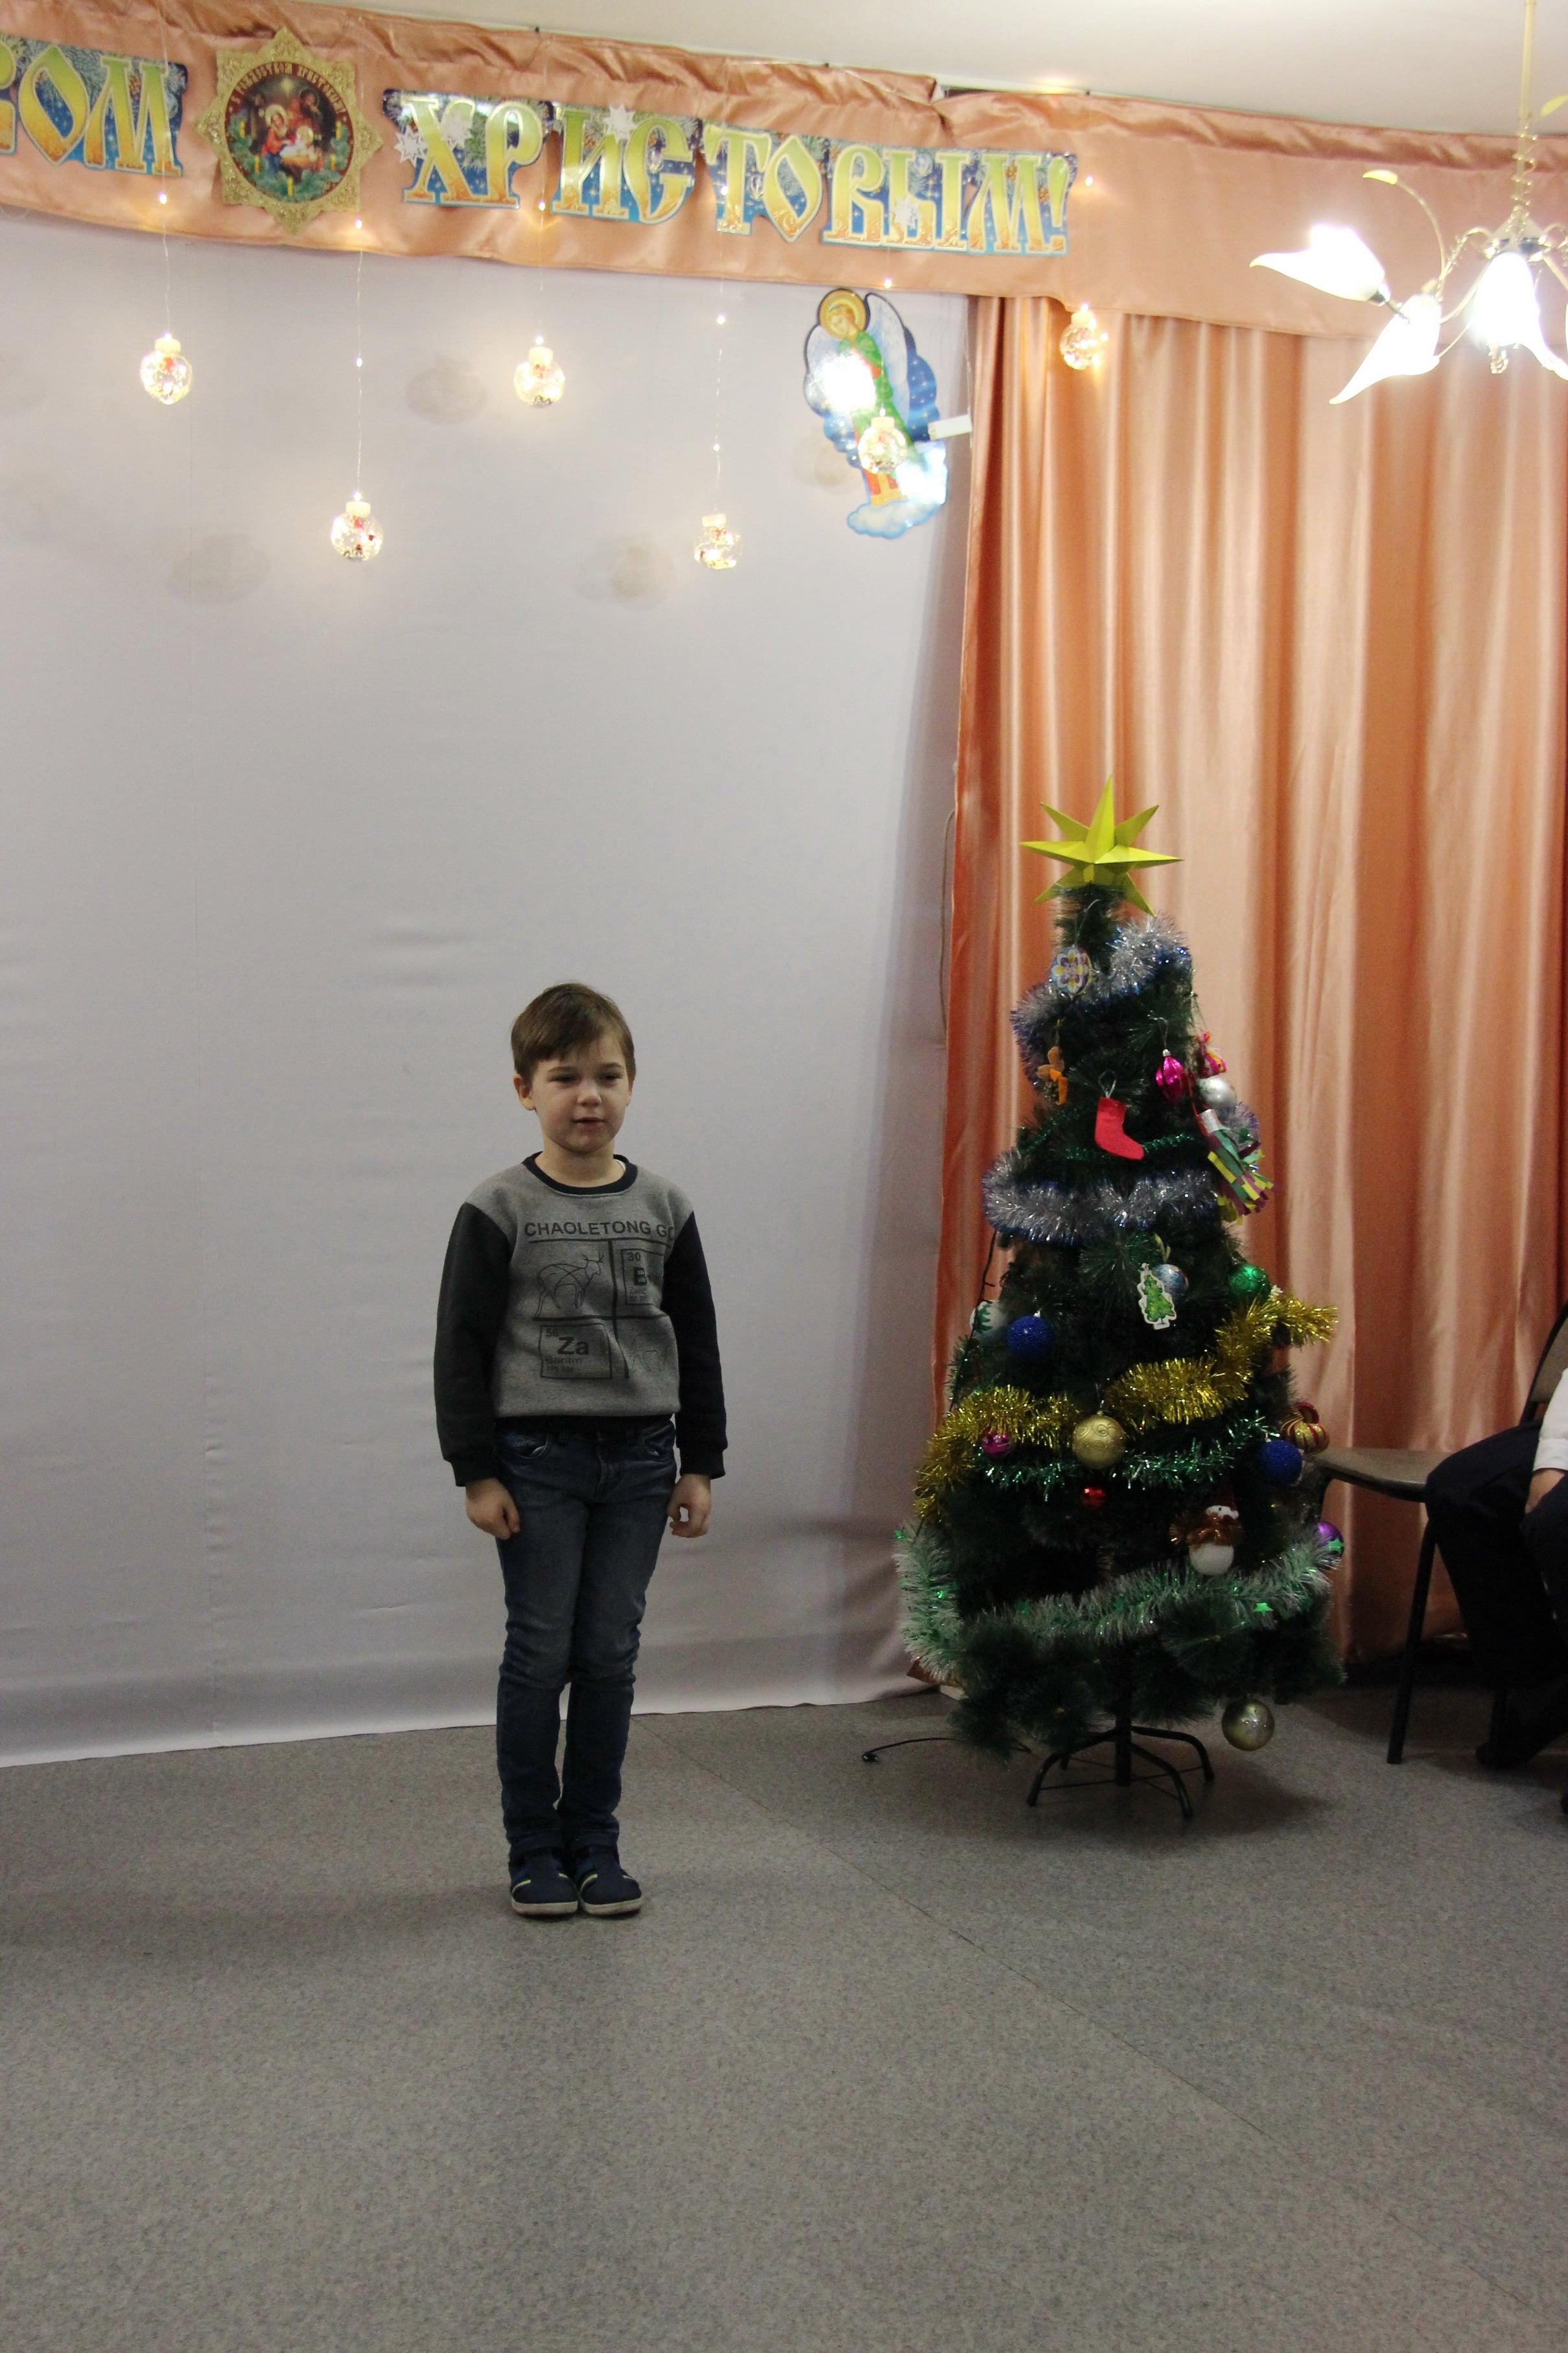 http://monuspen.ru/photoreports/17940e09f757605a37c57132604327ap.JPG